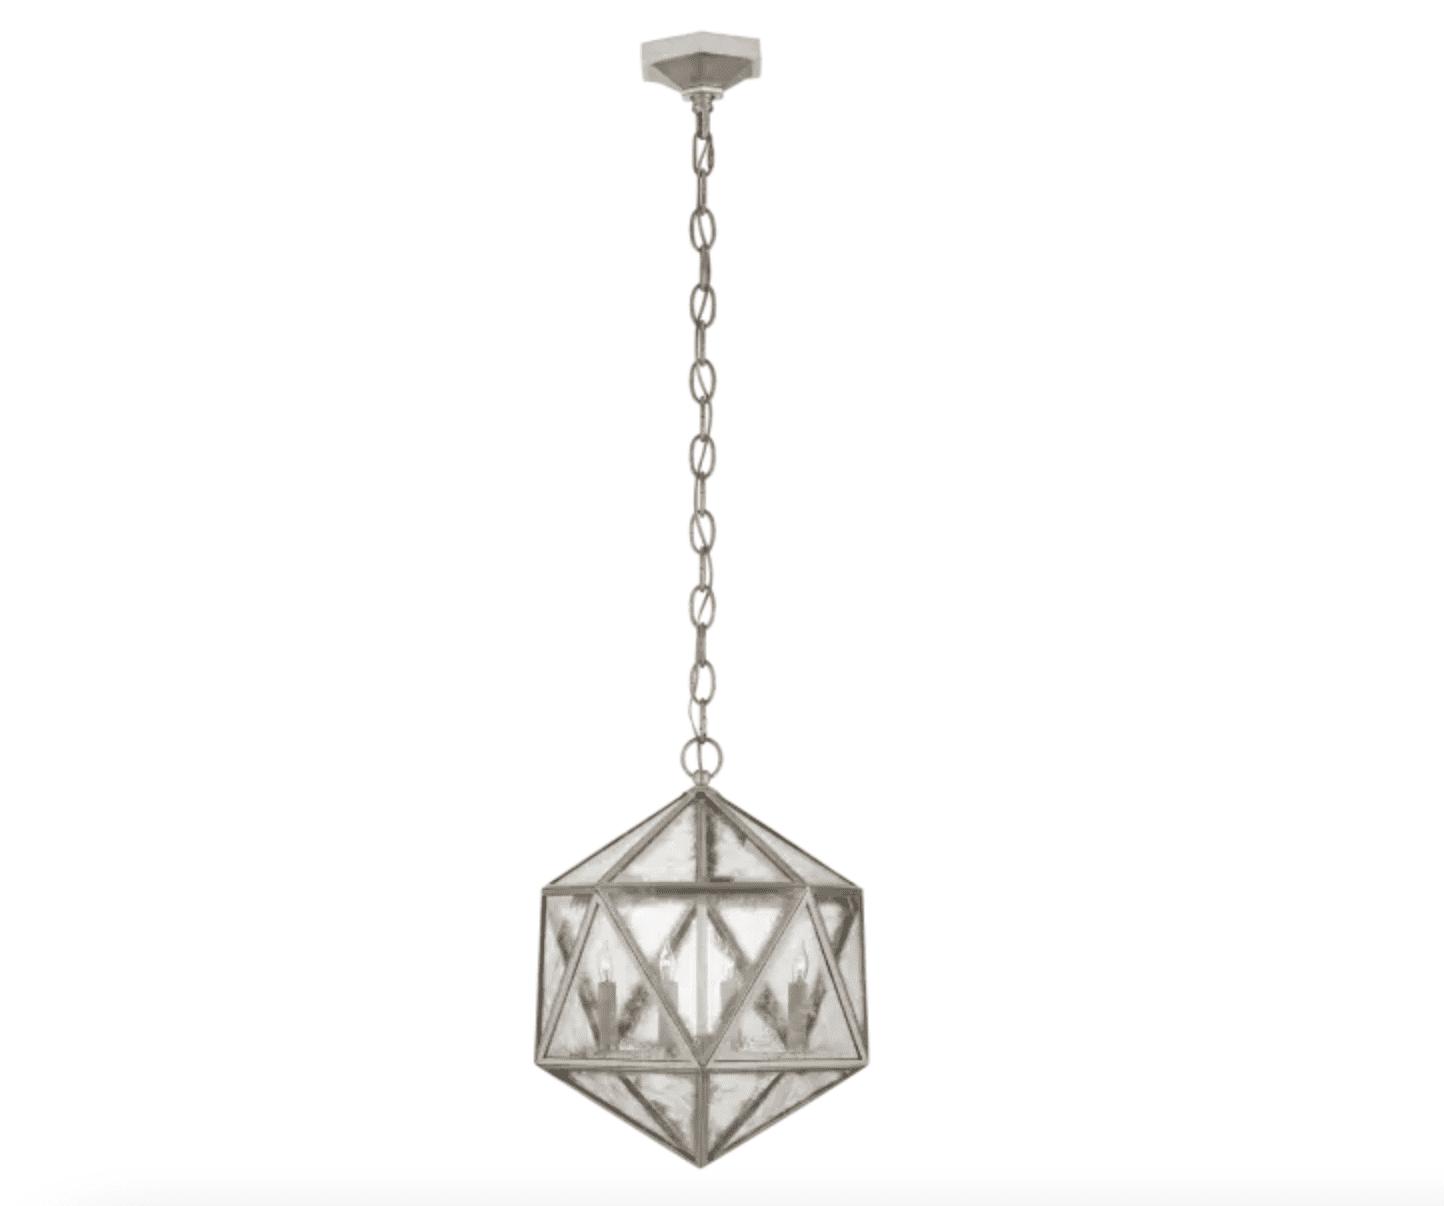 Zeno Medium 18 Facet Hedron Lantern